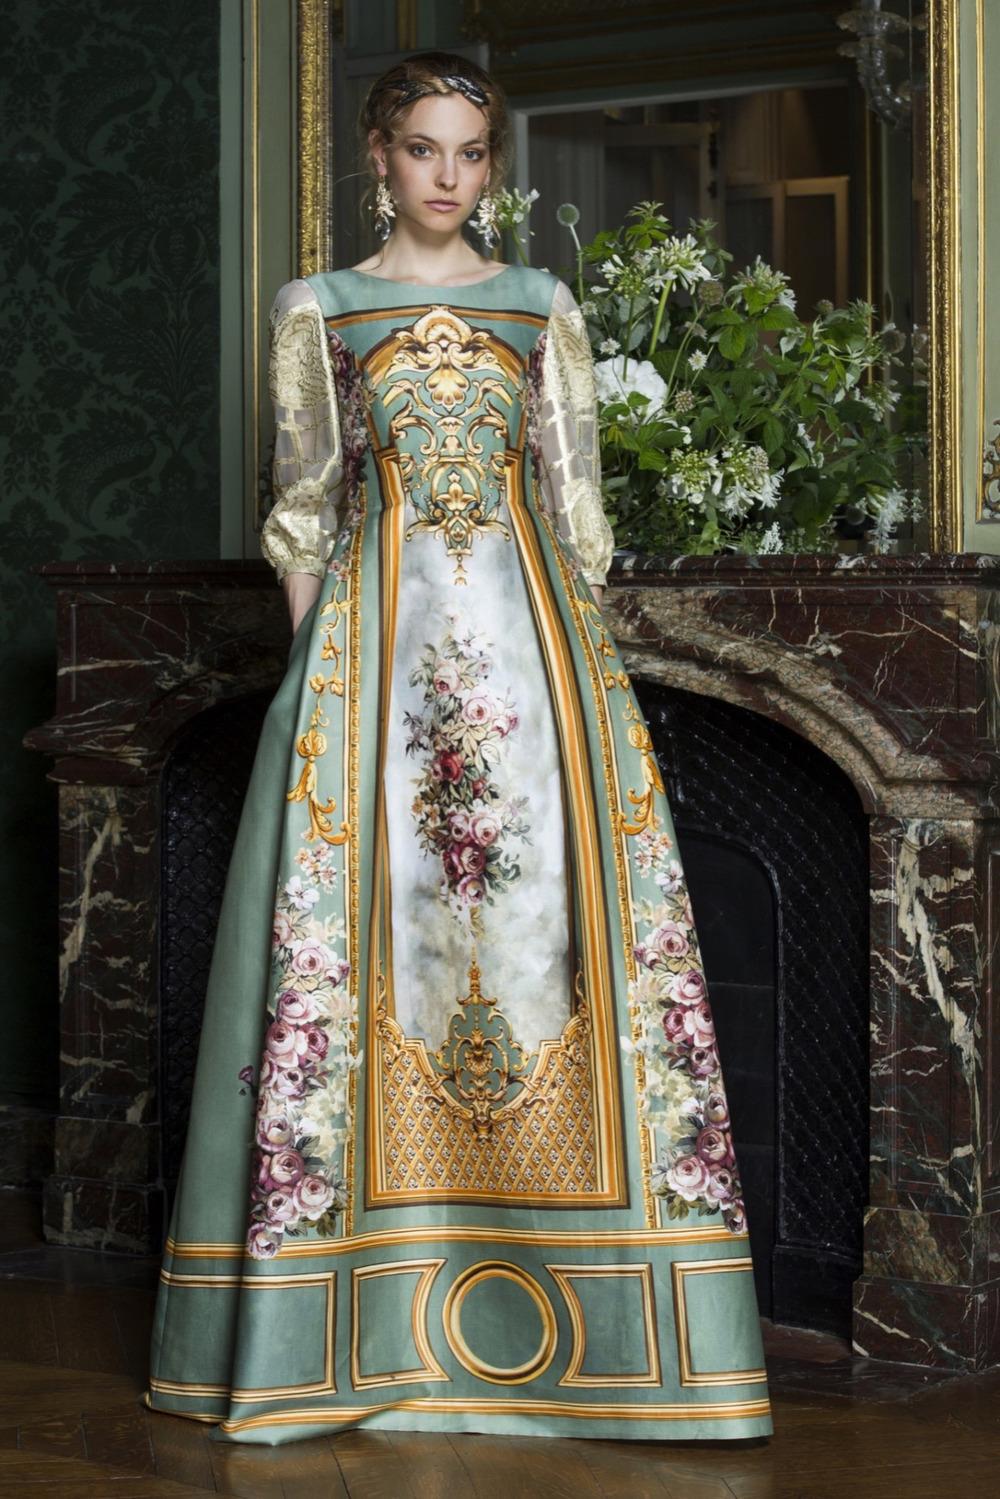 athena-manolopoulos: Alberta Ferretti 2015 FW Couture ⇡{clickformoreinspiration}